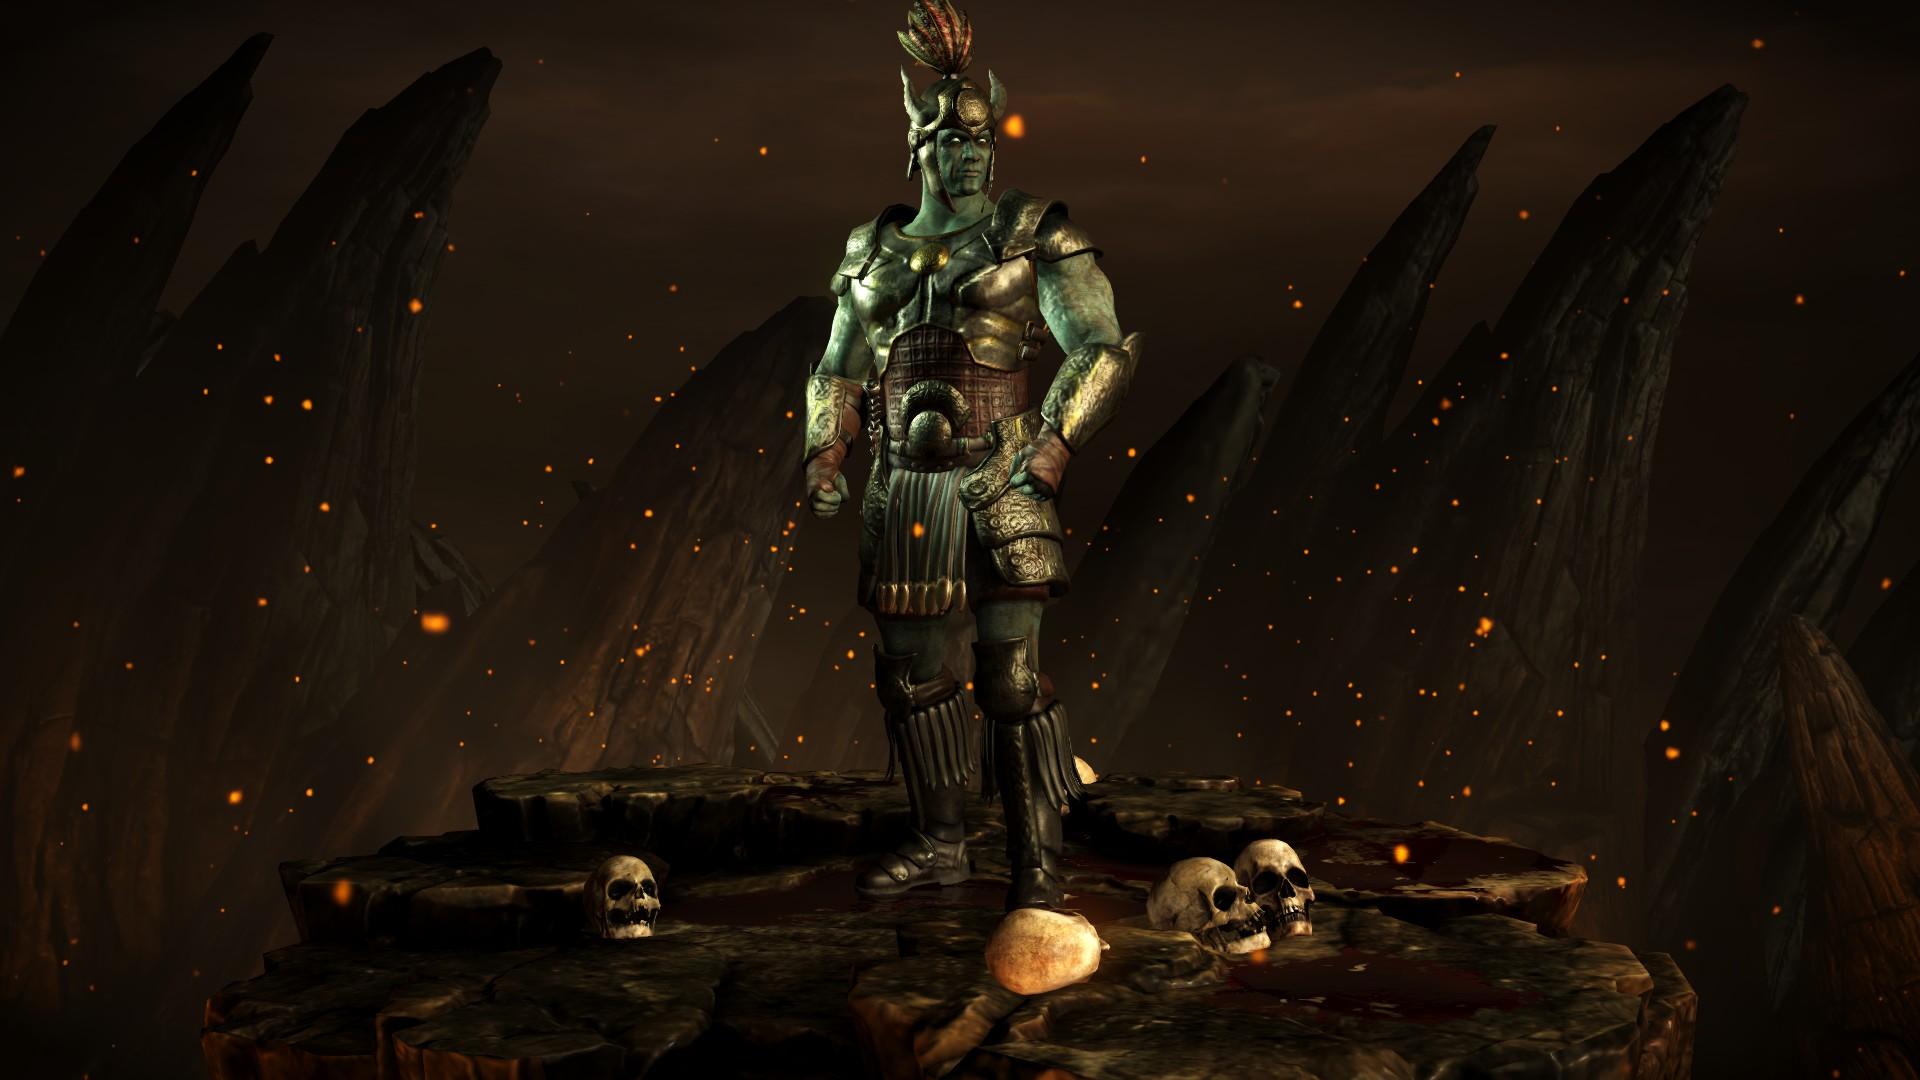 Коталь Кан (Костюм: Тёмный лорд) - Mortal Kombat X Коталь Кан